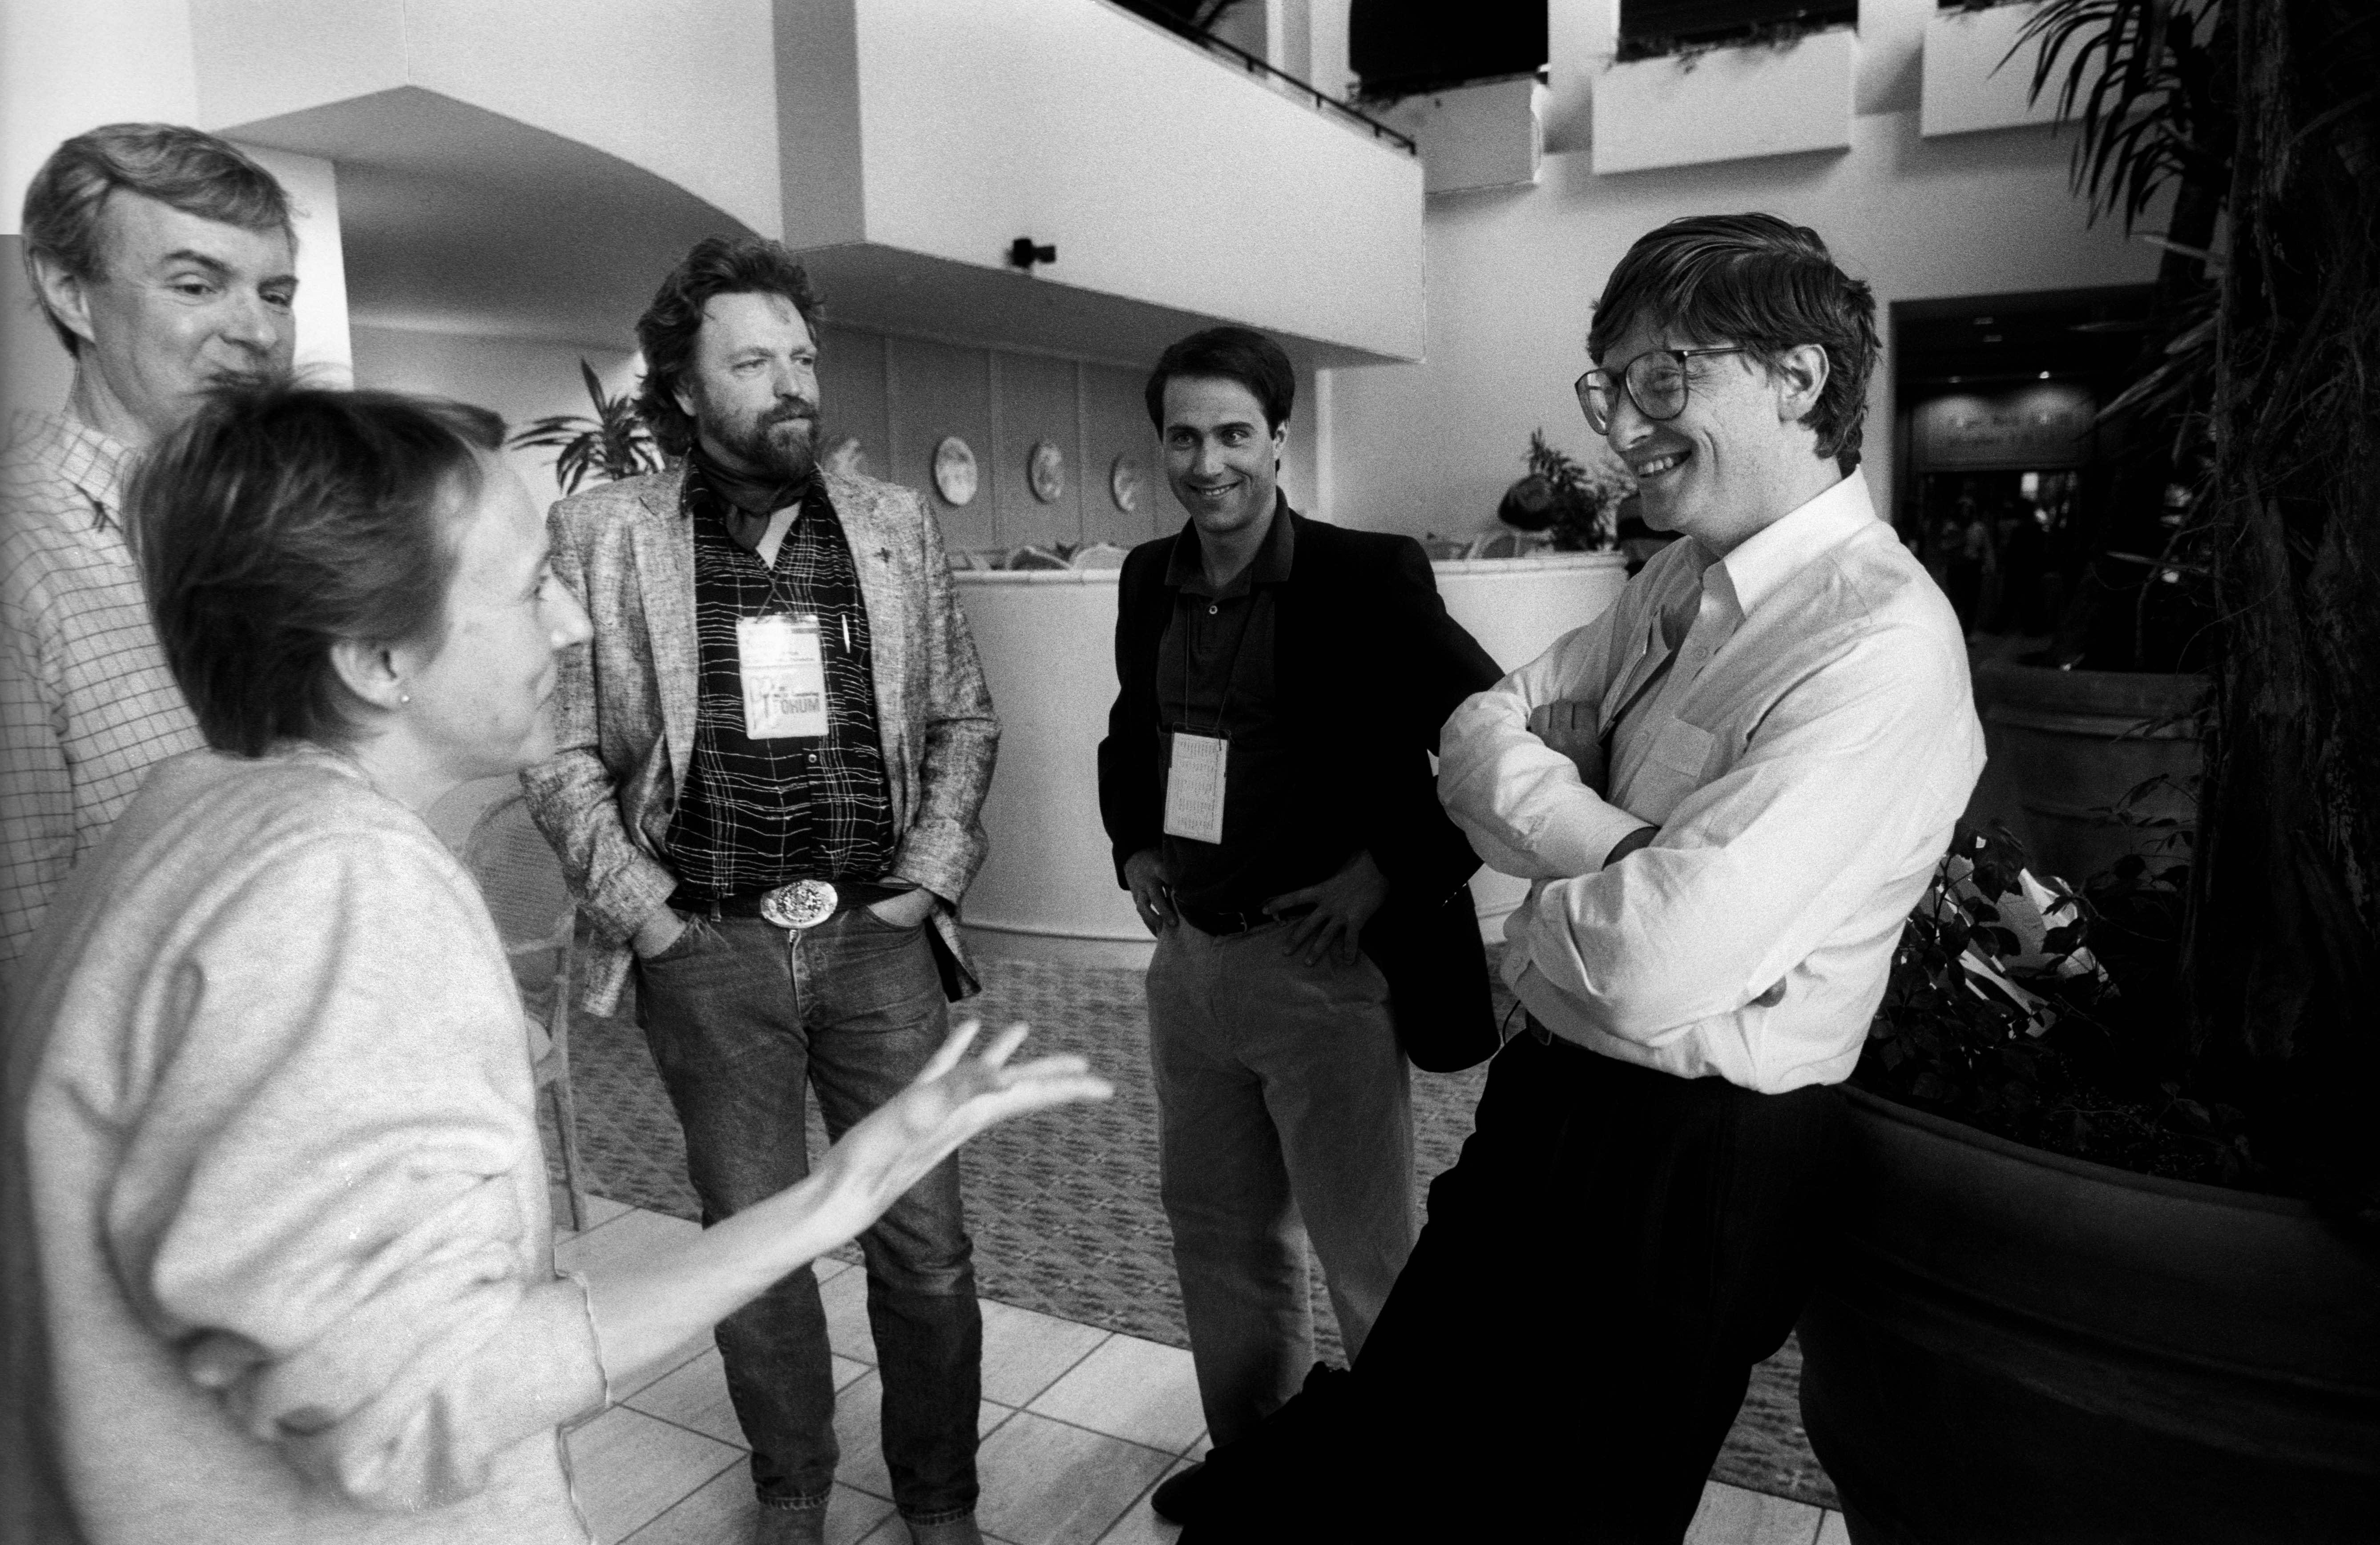 Esther Dyson, John Perry Barlow, David Readerman, Shearson Leahman, Bill Gates 1991 bei einer Computer-Konferenz